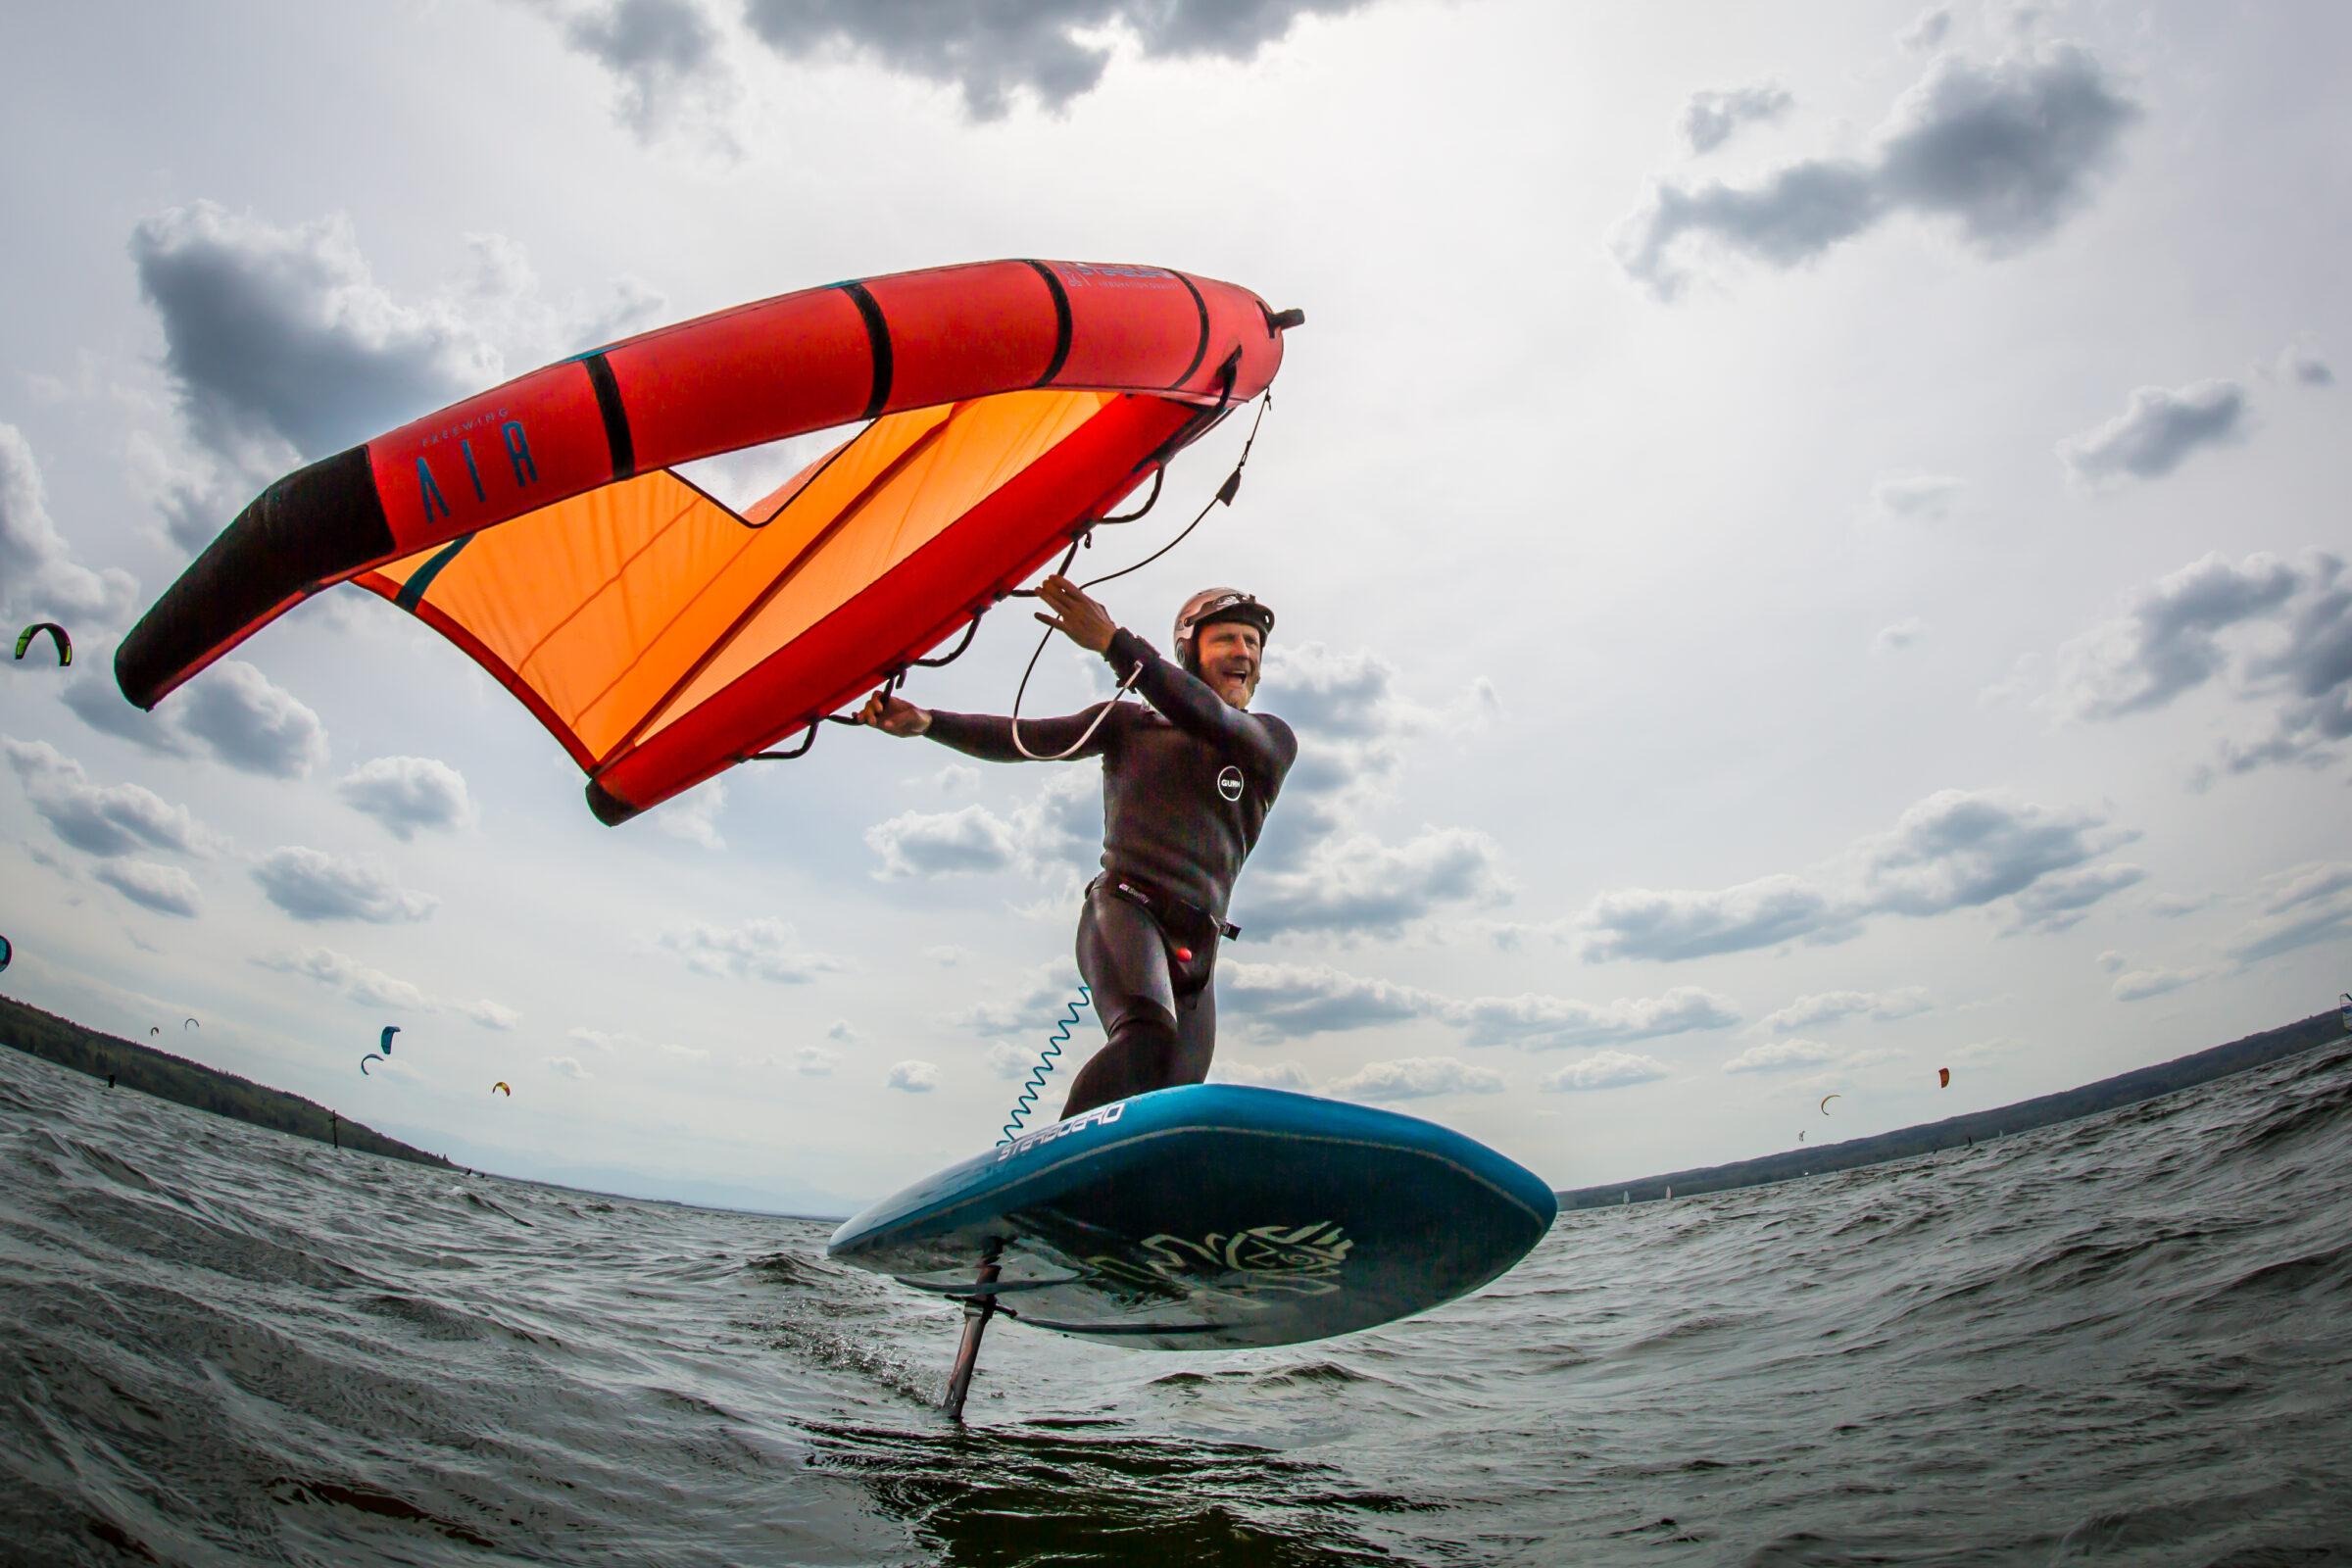 wingfoil magazine_Rider-Carsten-Kumis-FotobyKLOTZI-16